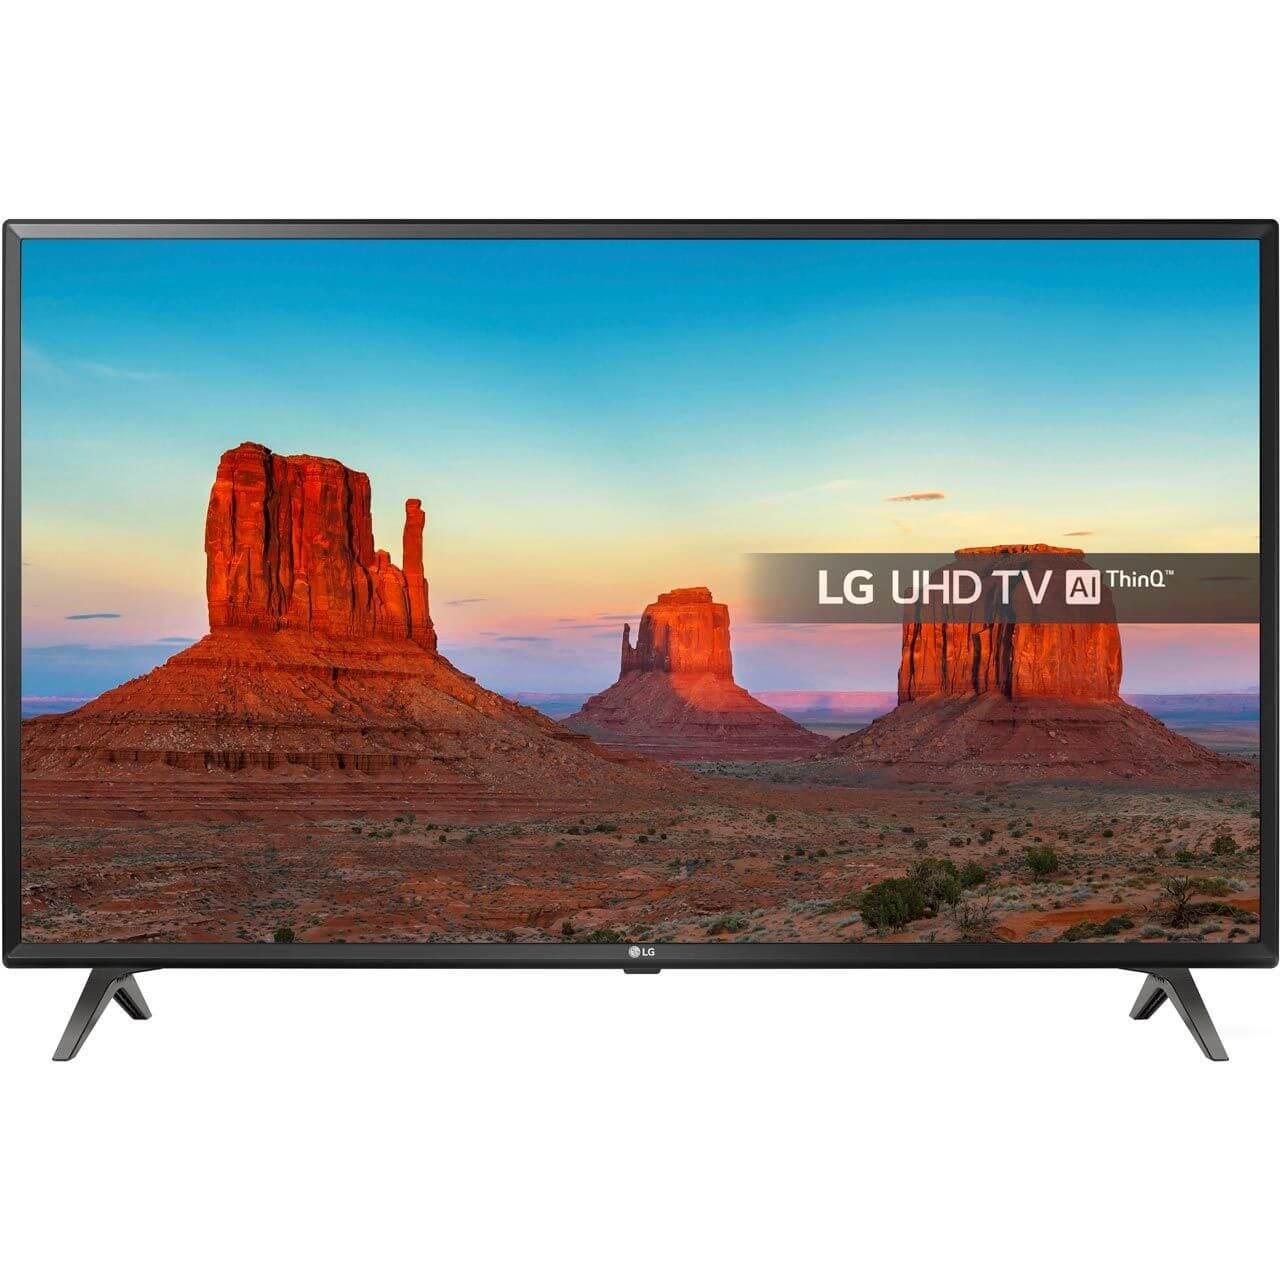 LG 65UK6300PLB UHD 65 Inch Smart LED TV 4K Ultra HD 3 HDMI